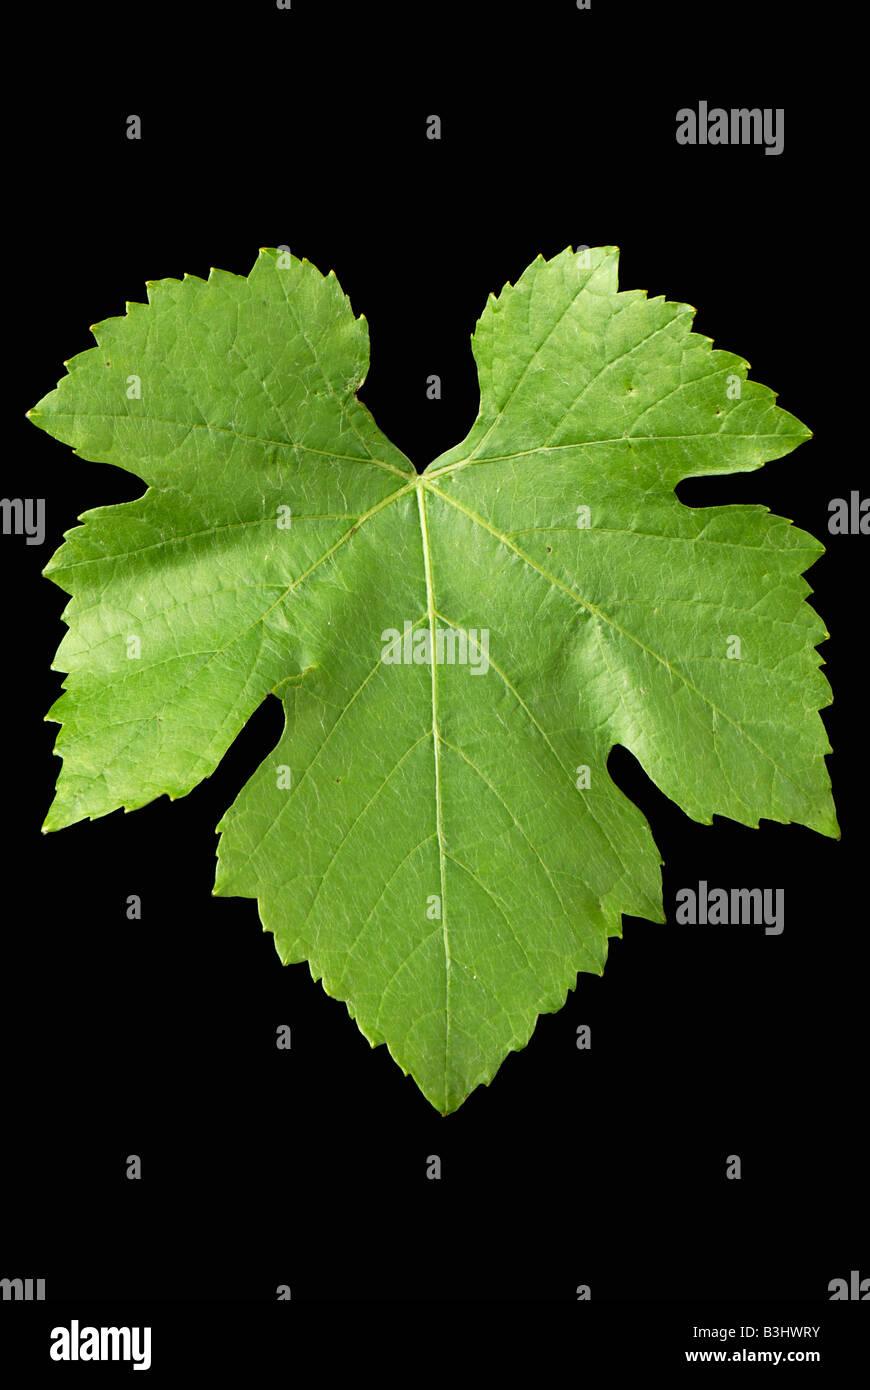 A single vine leaf against a black background - Stock Image